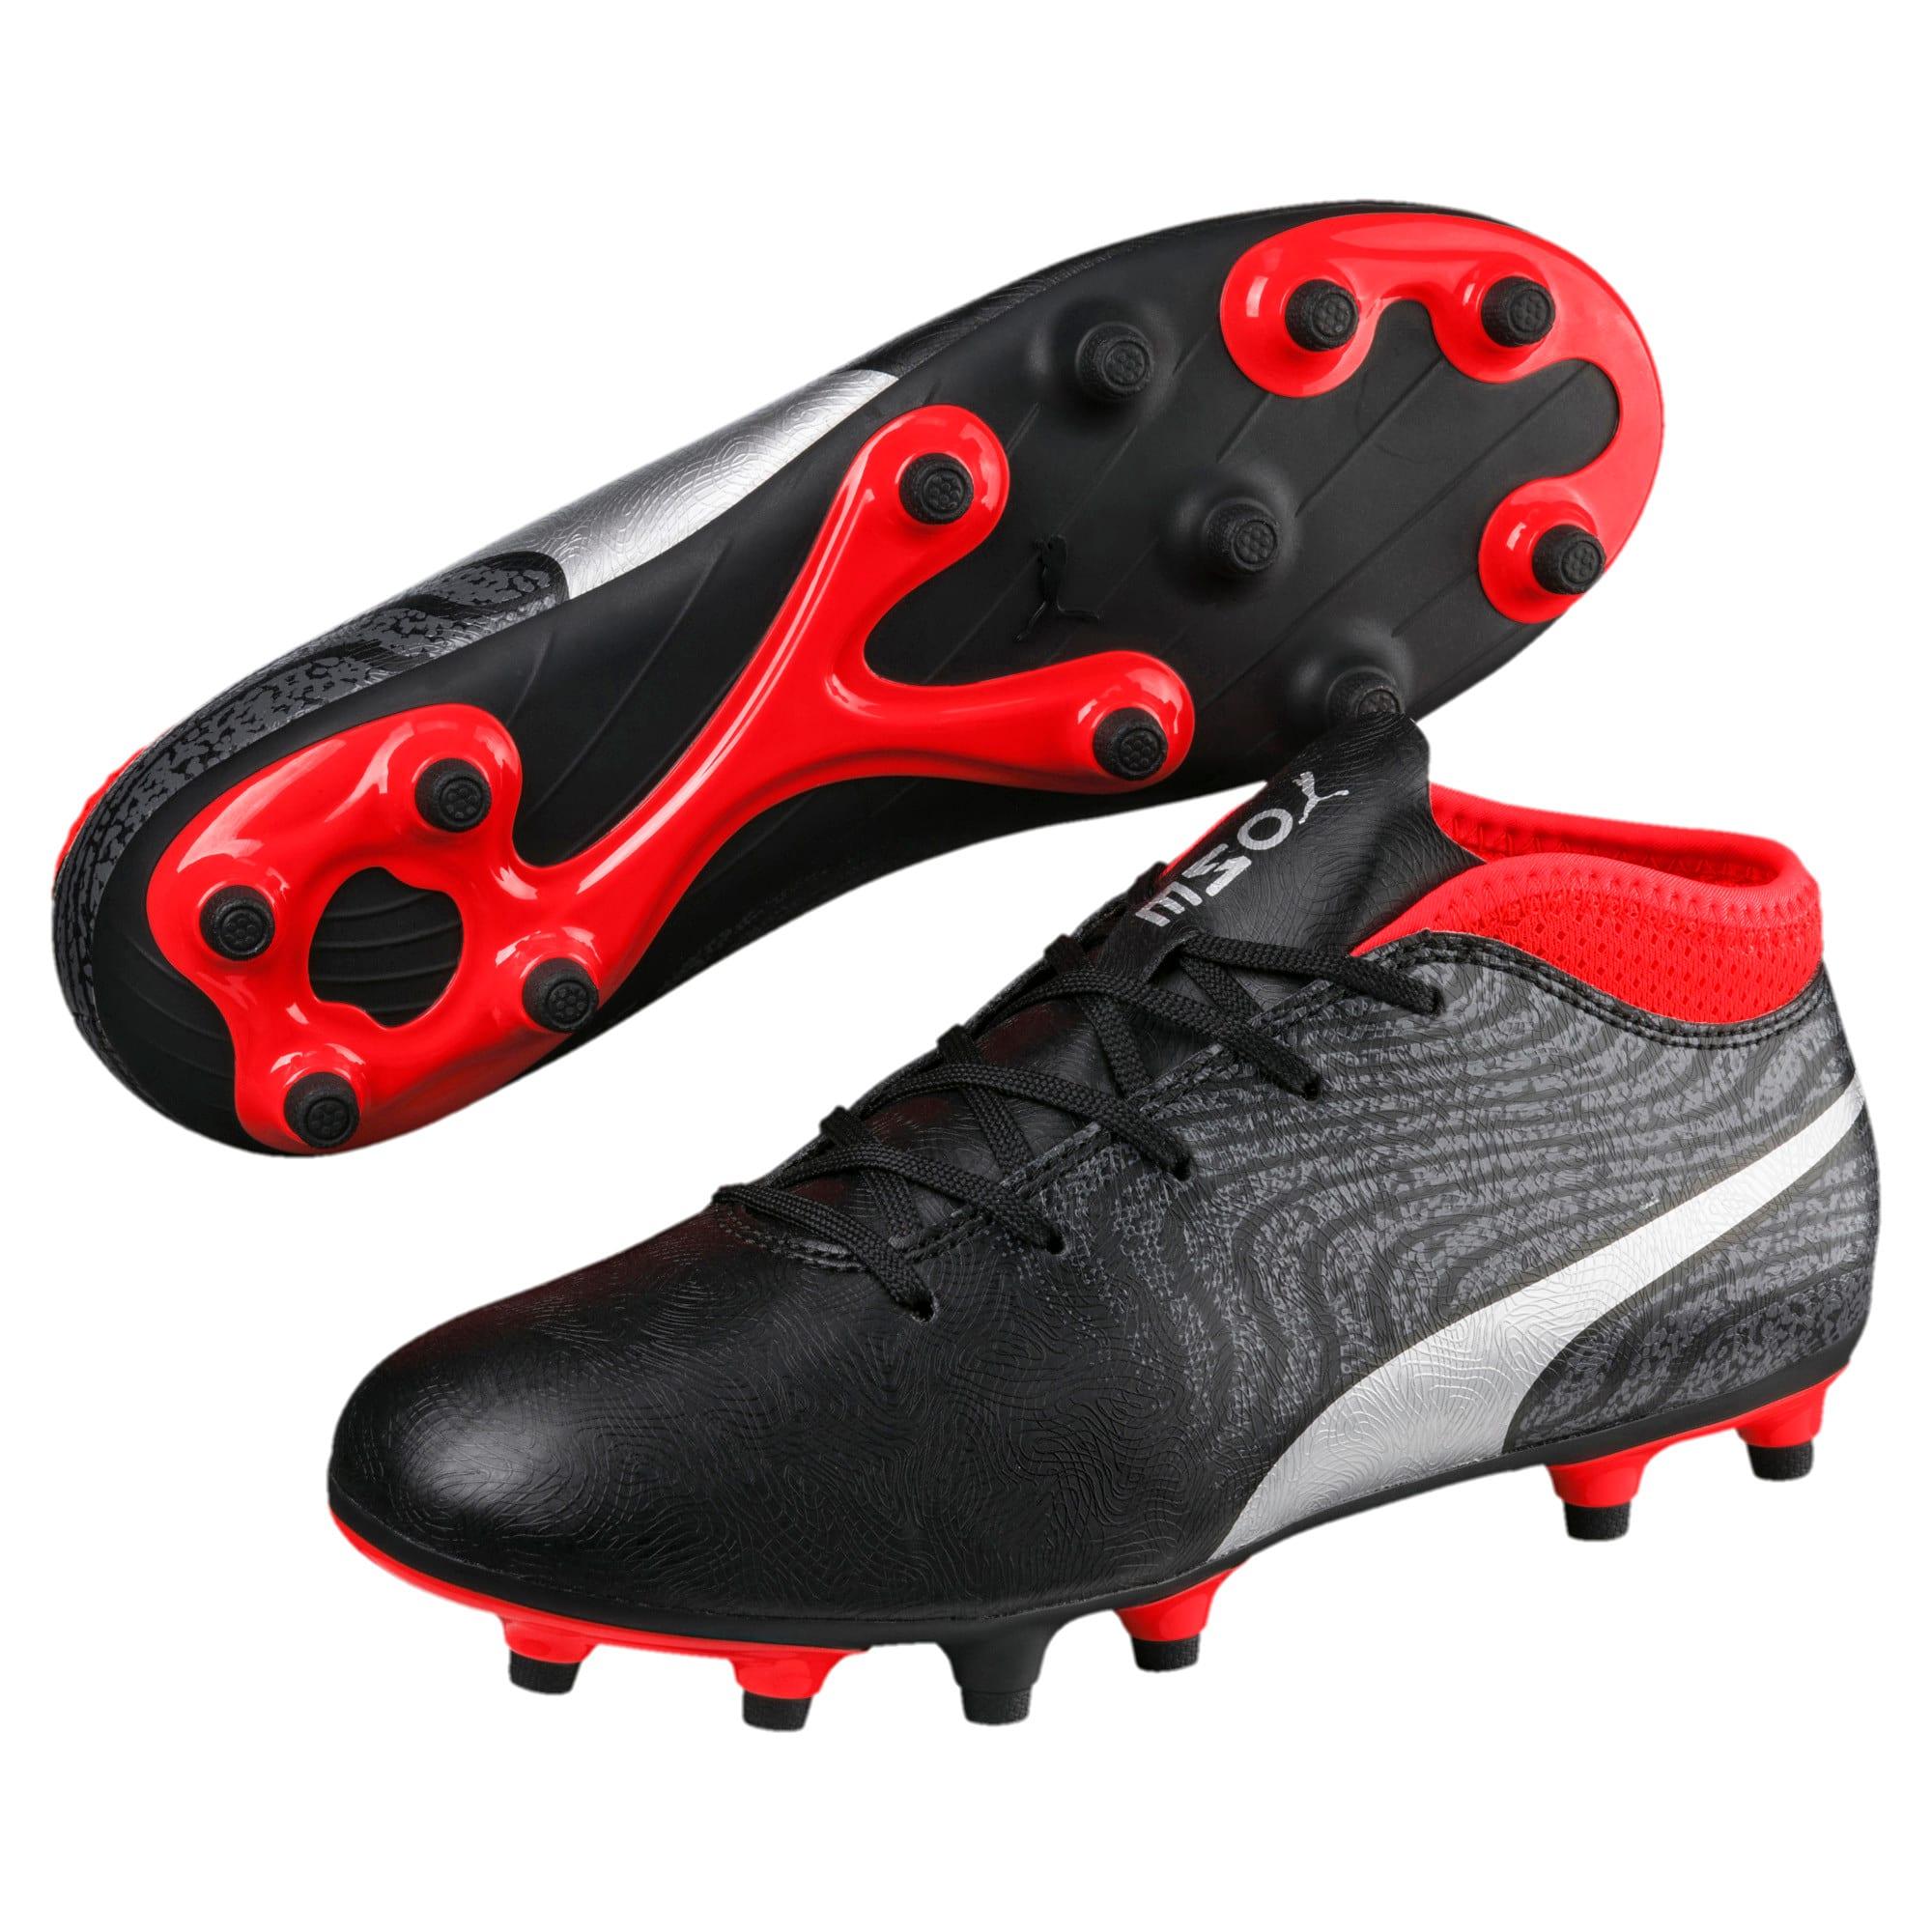 Thumbnail 2 of ONE 18.4 FG Soccer Cleats JR, Black-Silver-Red, medium